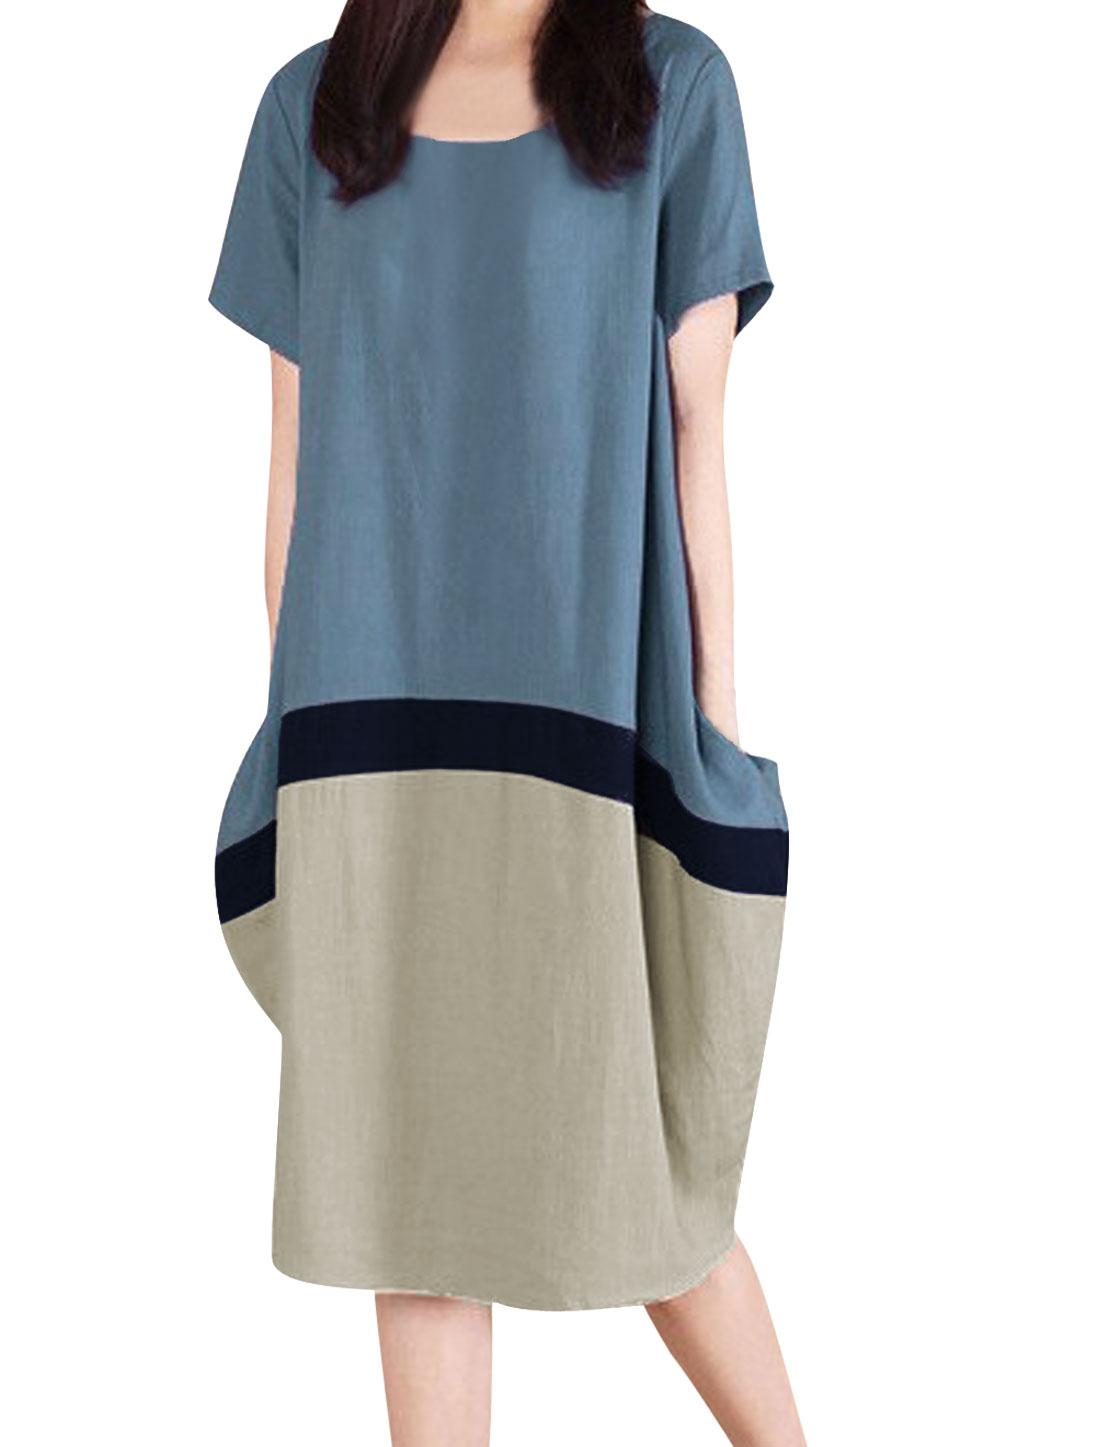 Lady Short Sleeve Colorblock Knee-Length Linen Dress Dark Teal XS